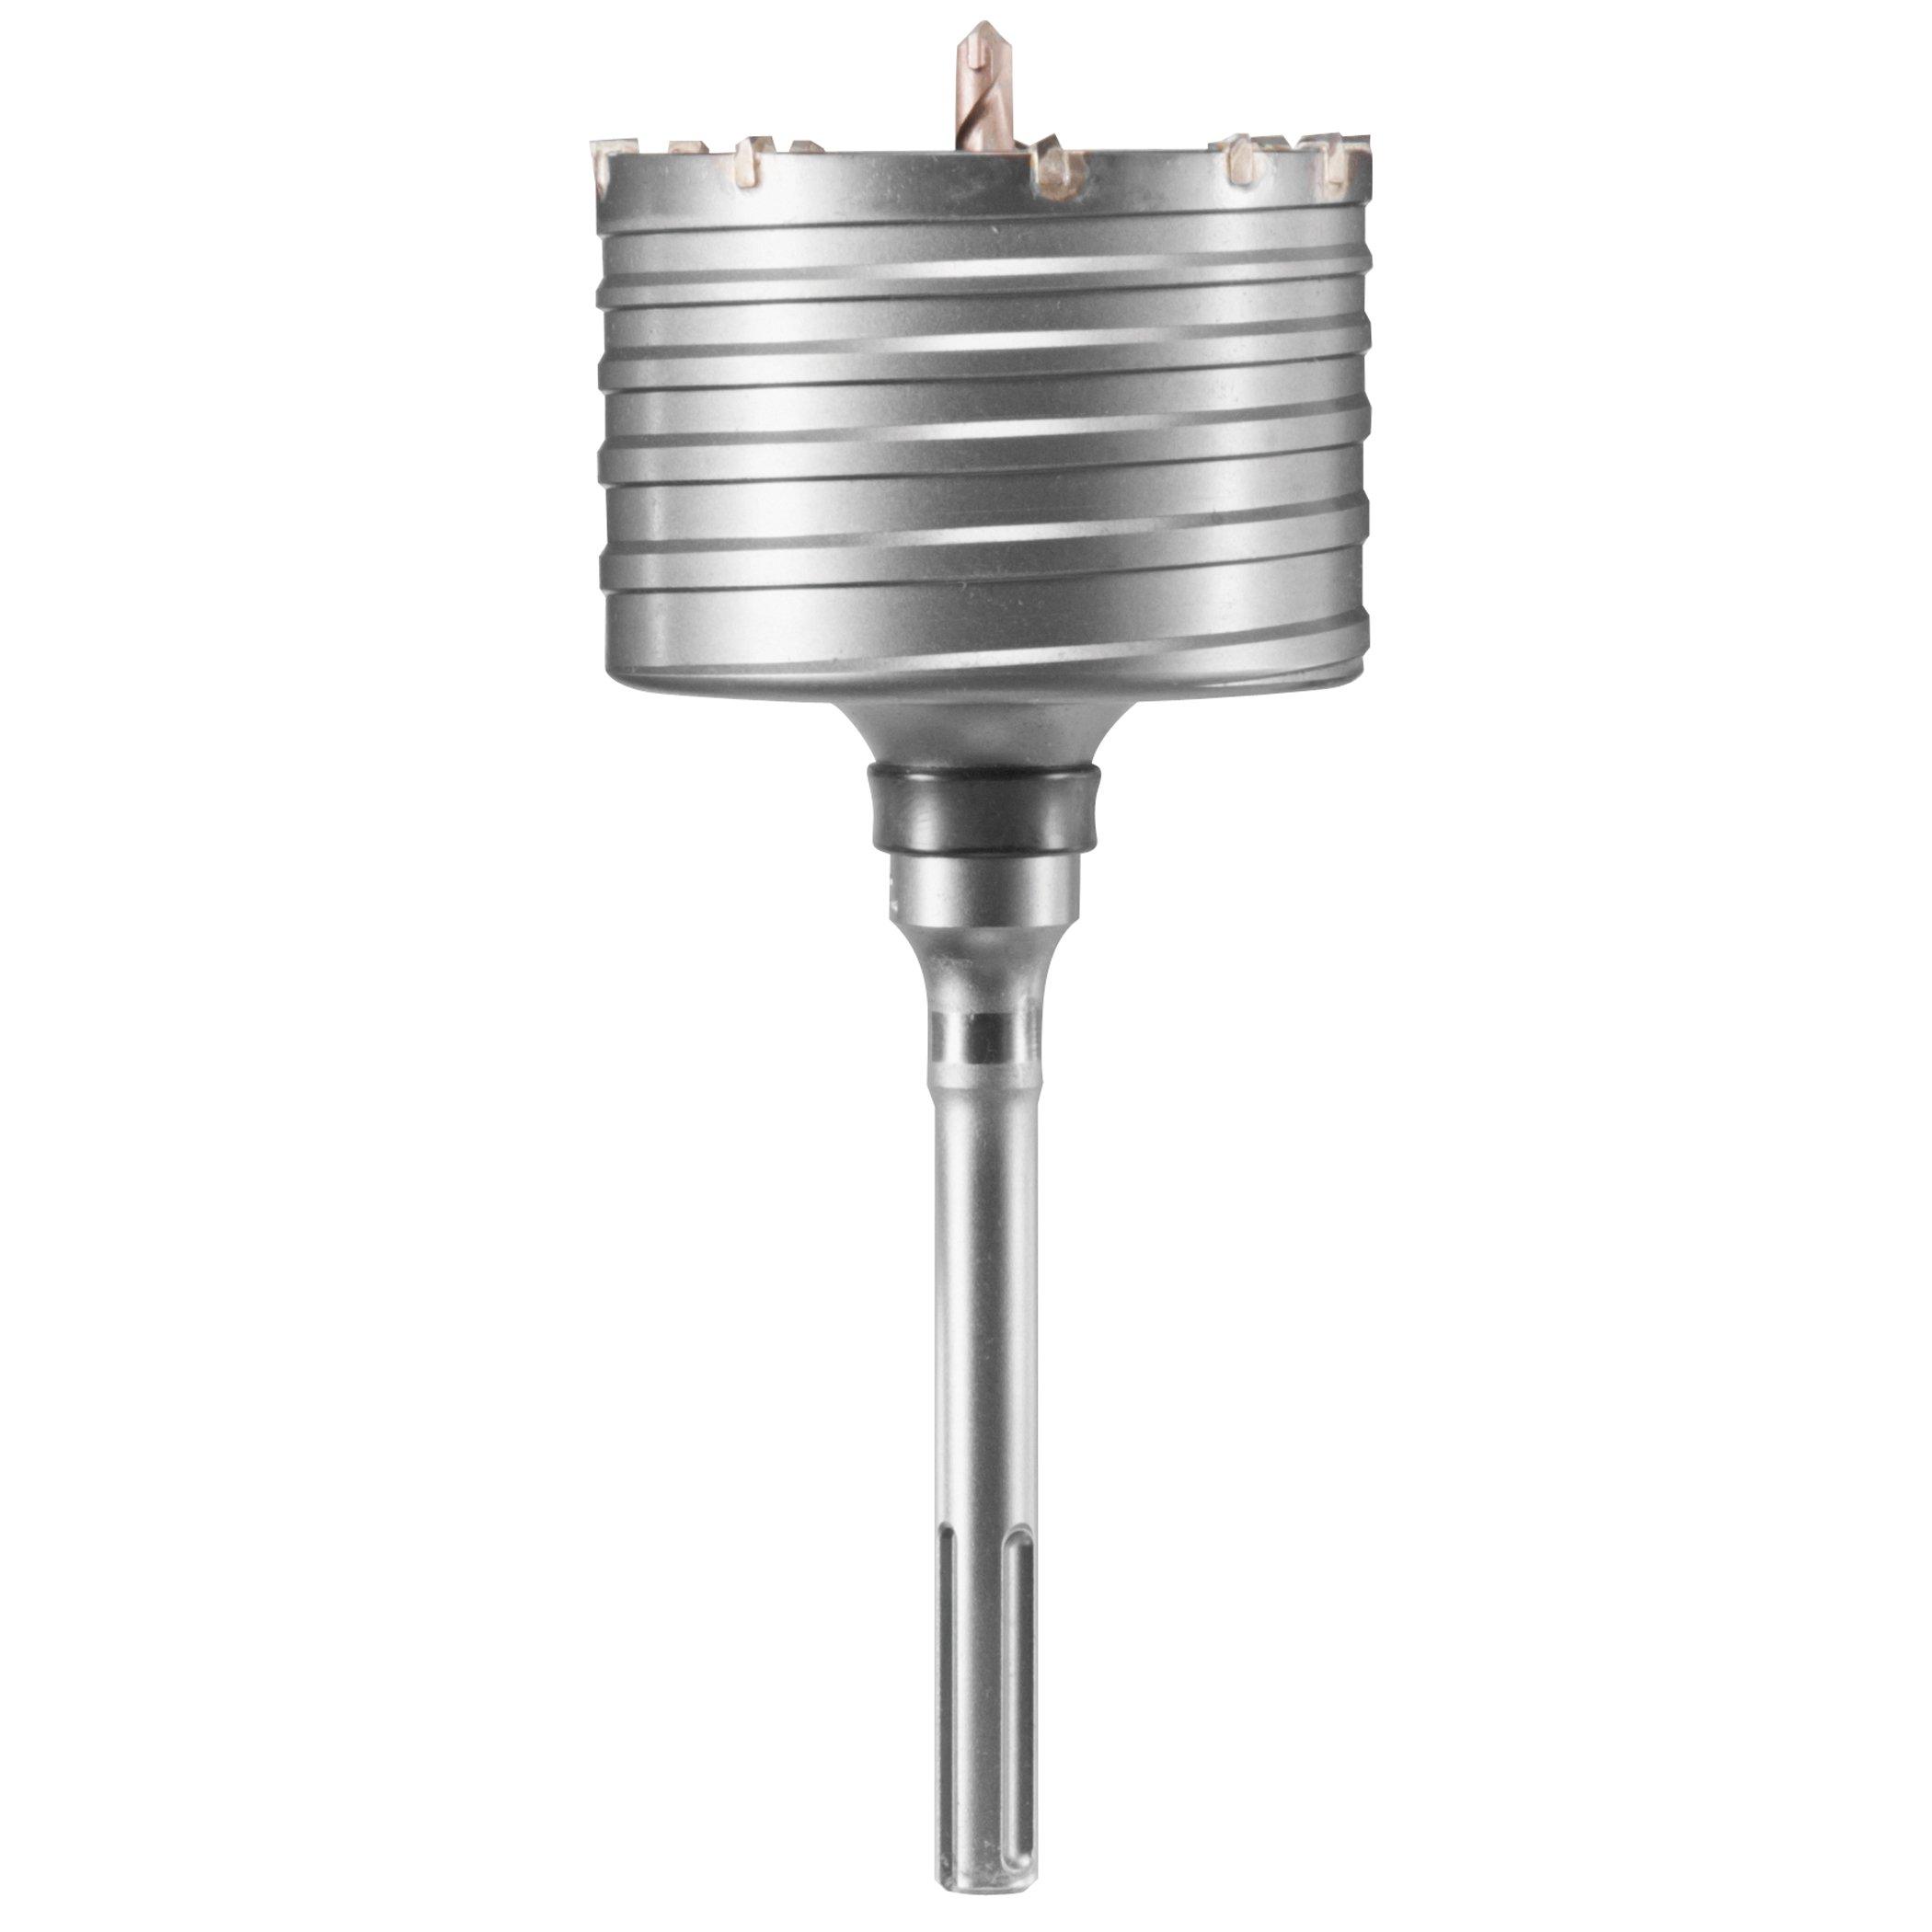 Bosch HC8570 5-Inch X 12-Inch Sds-Max Rotary Hammer Core Bit